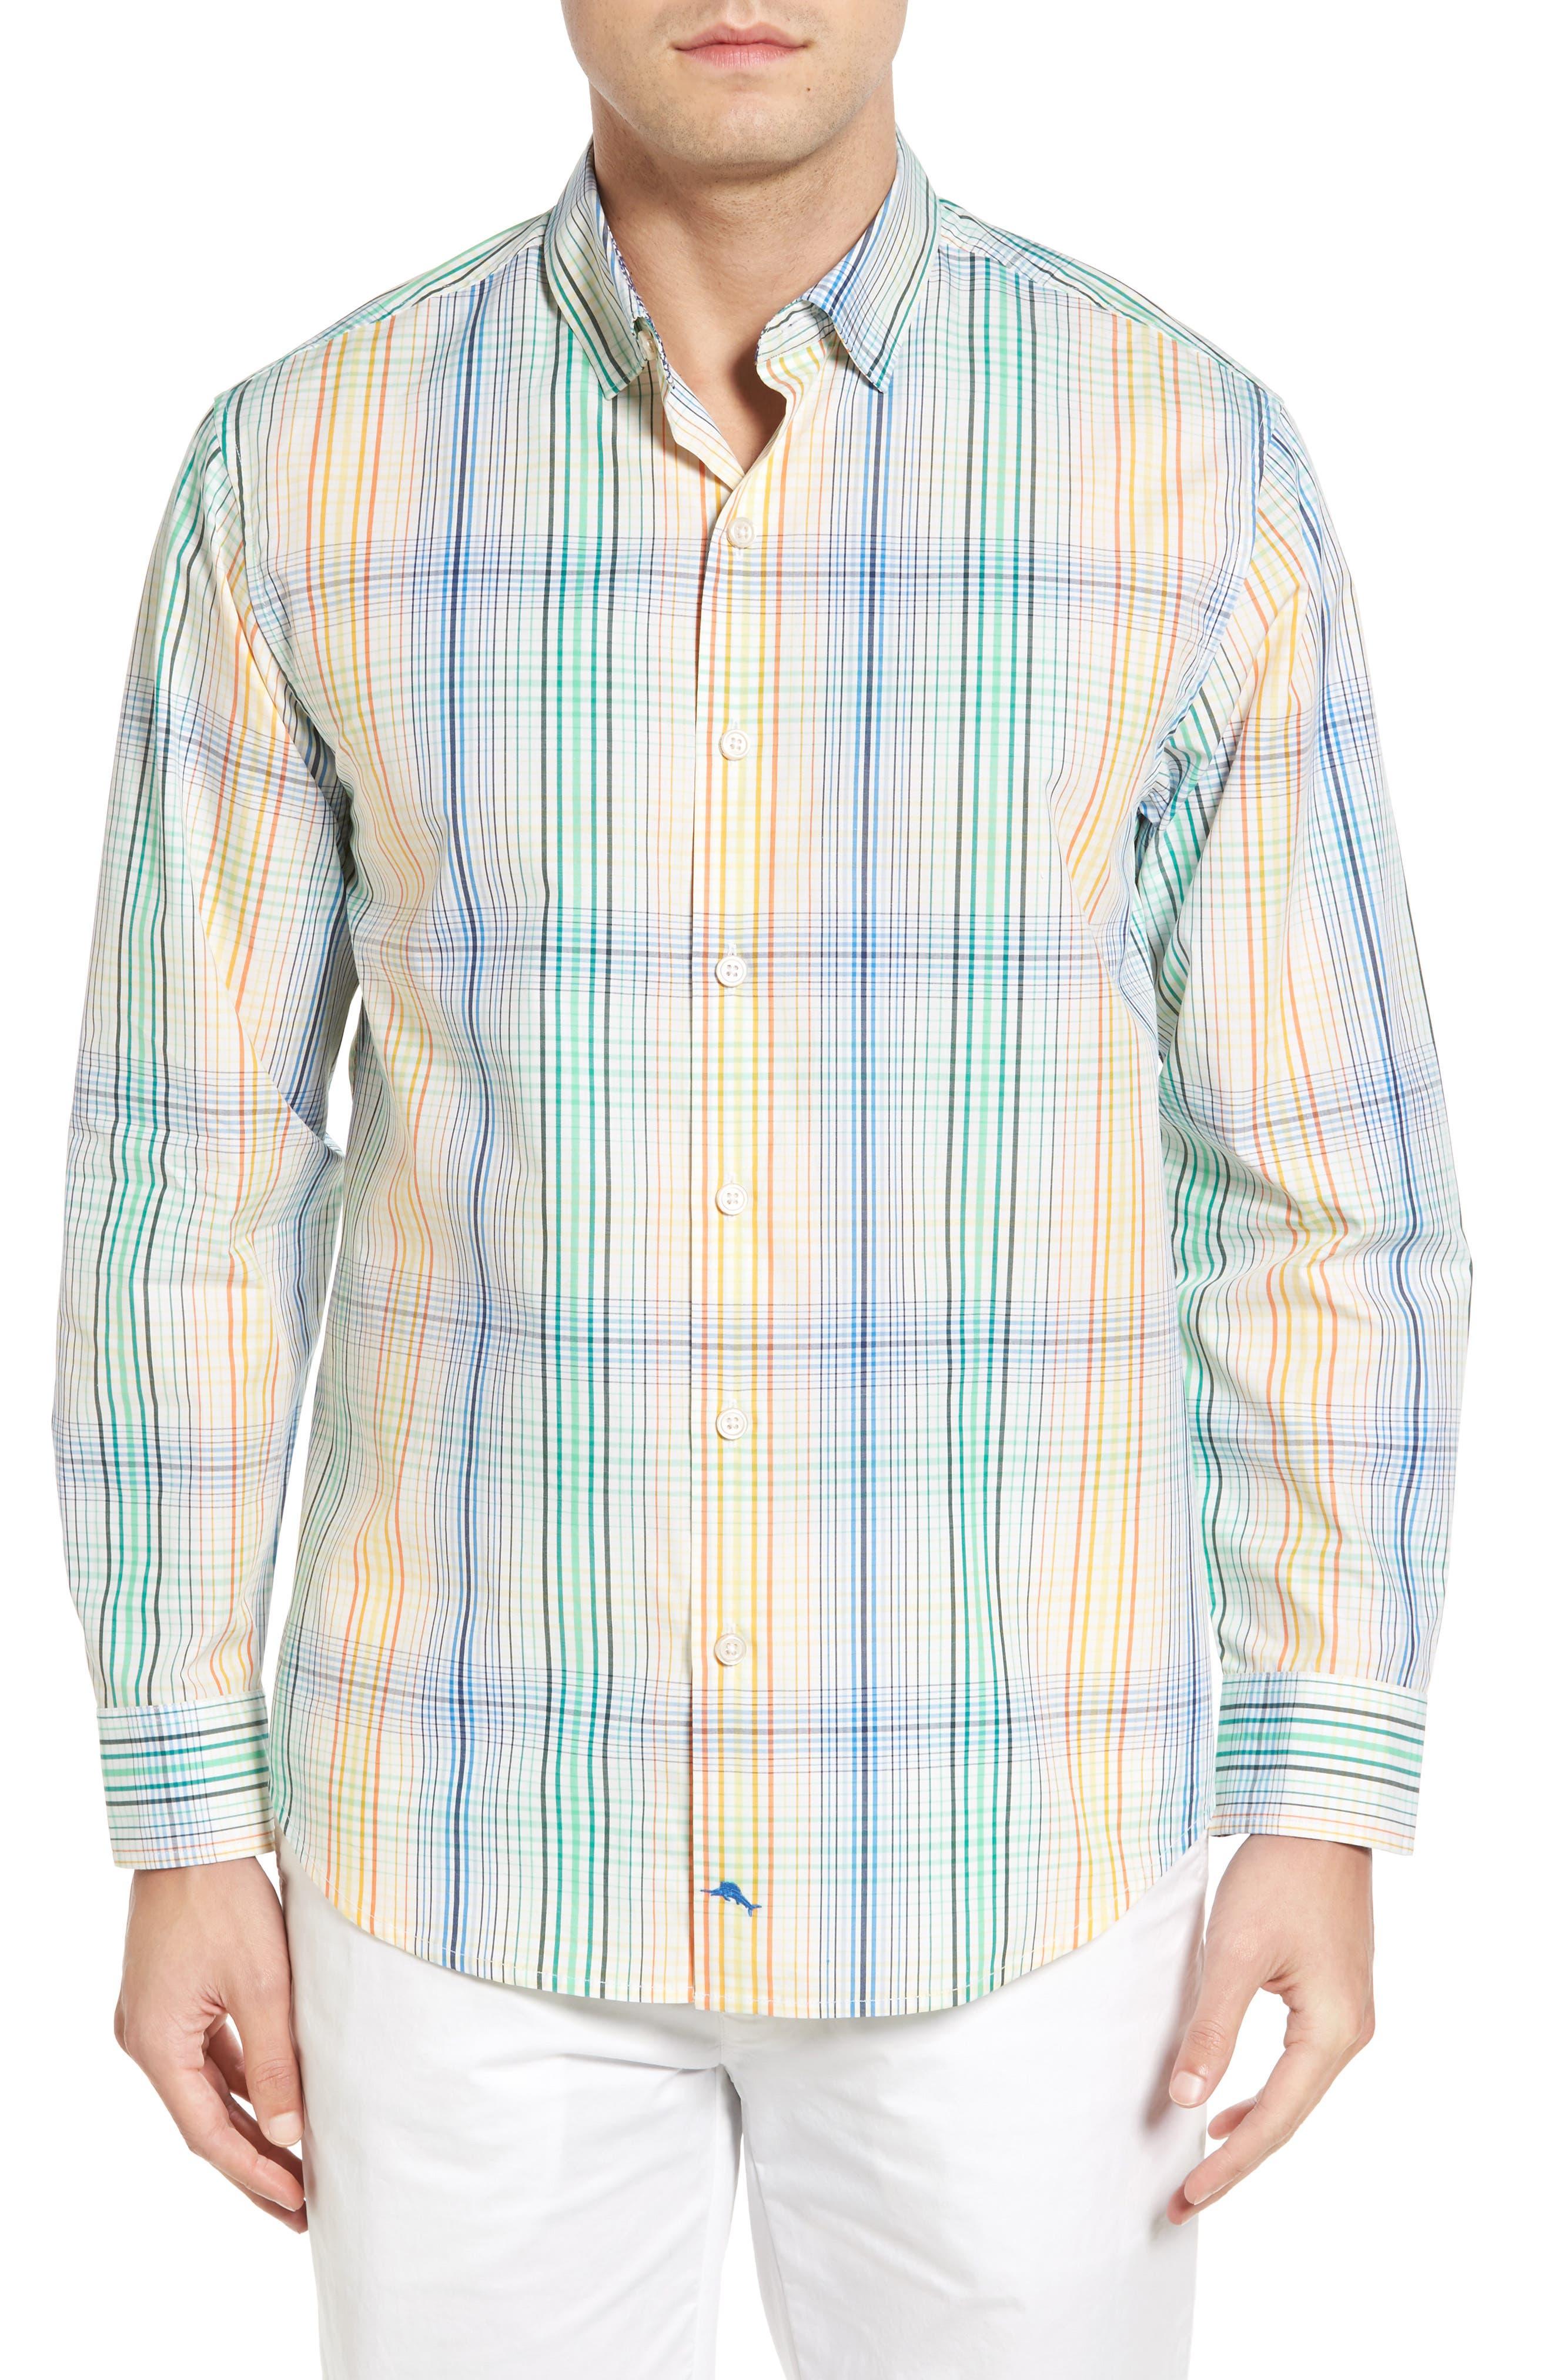 Alternate Image 1 Selected - Tommy Bahama Metala Plaid Sport Shirt